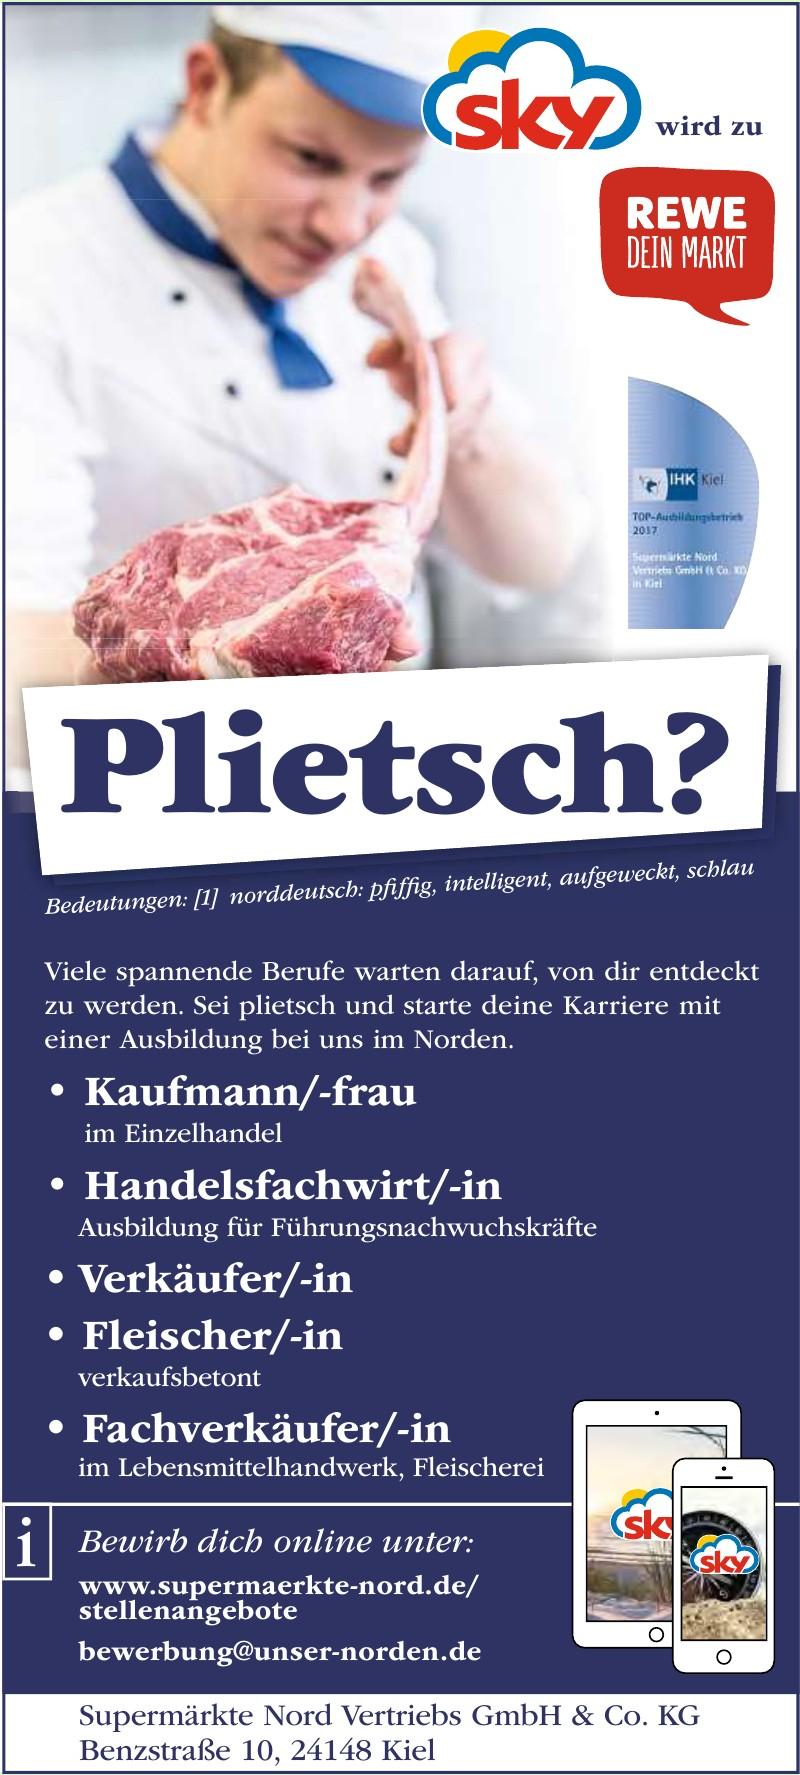 Supermärkte Nord Vertriebs GmbH & Co. KG